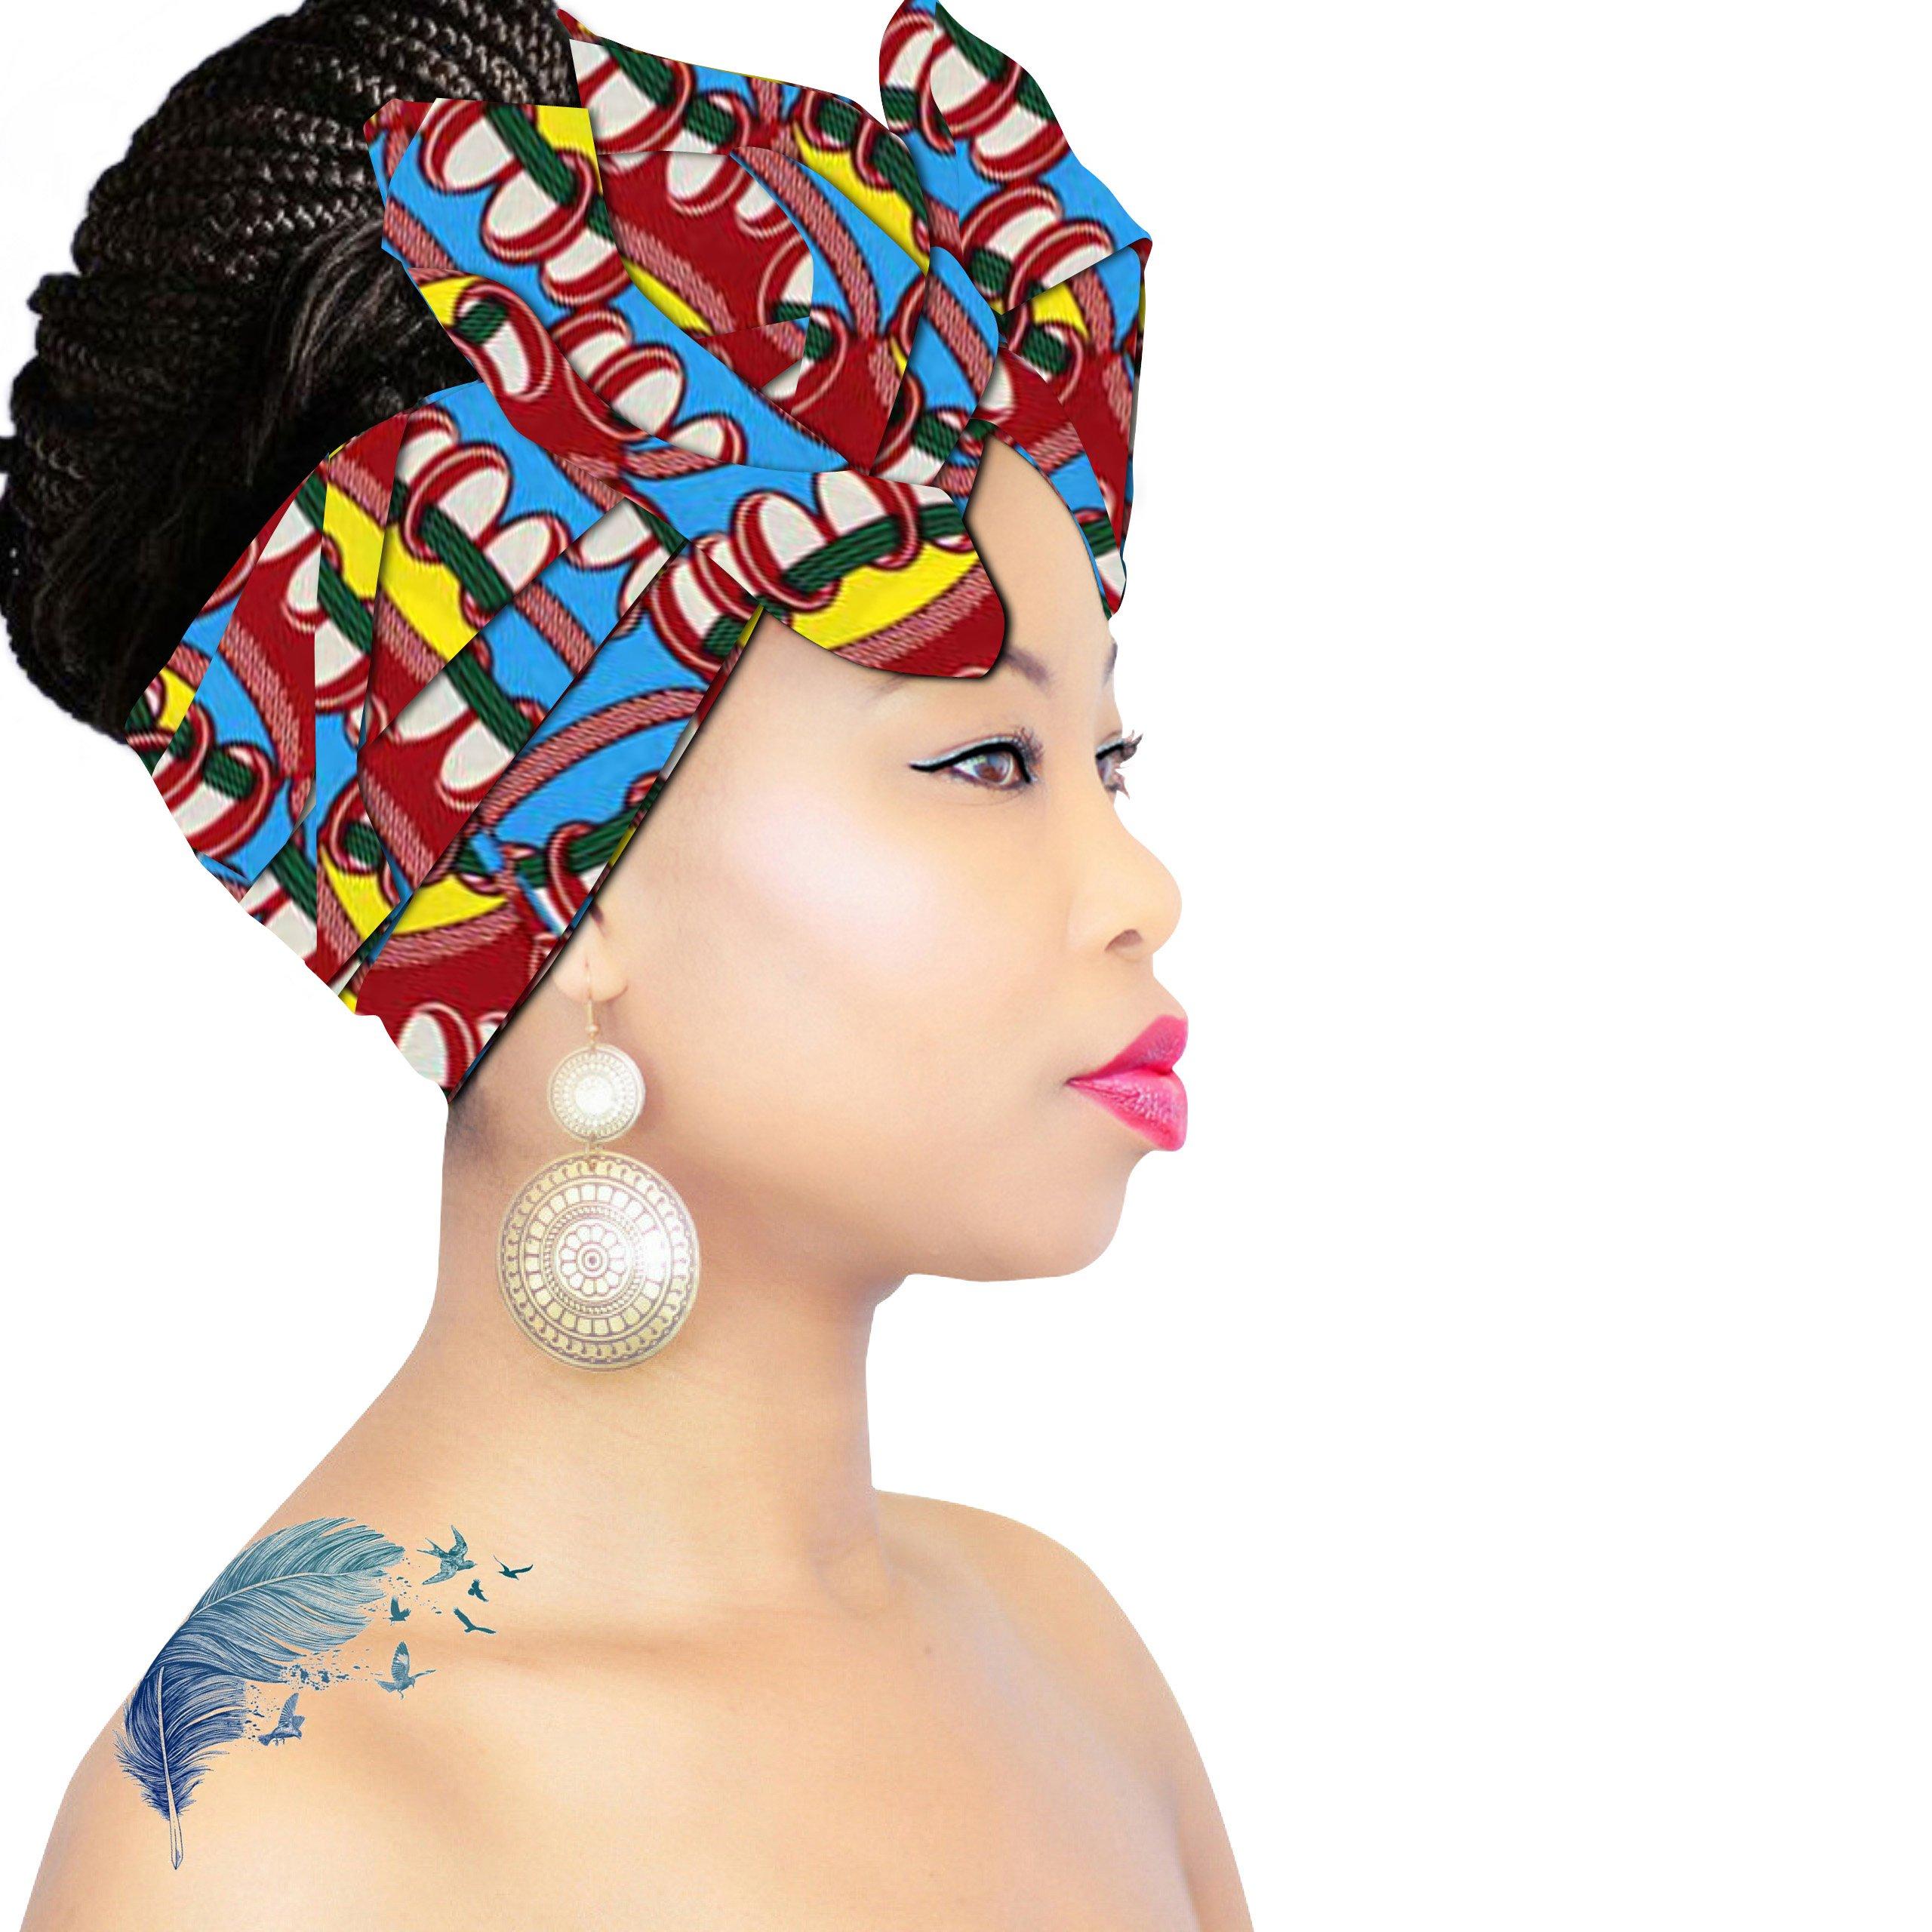 African Head Wrap   HEADBAND   HEAD WRAP   Hijab   PREMIUM QUALITY HEAD WRAP African Head Wraps Hair Loss African Fabric Turban Headband Muslim Head Cover Under Scarf